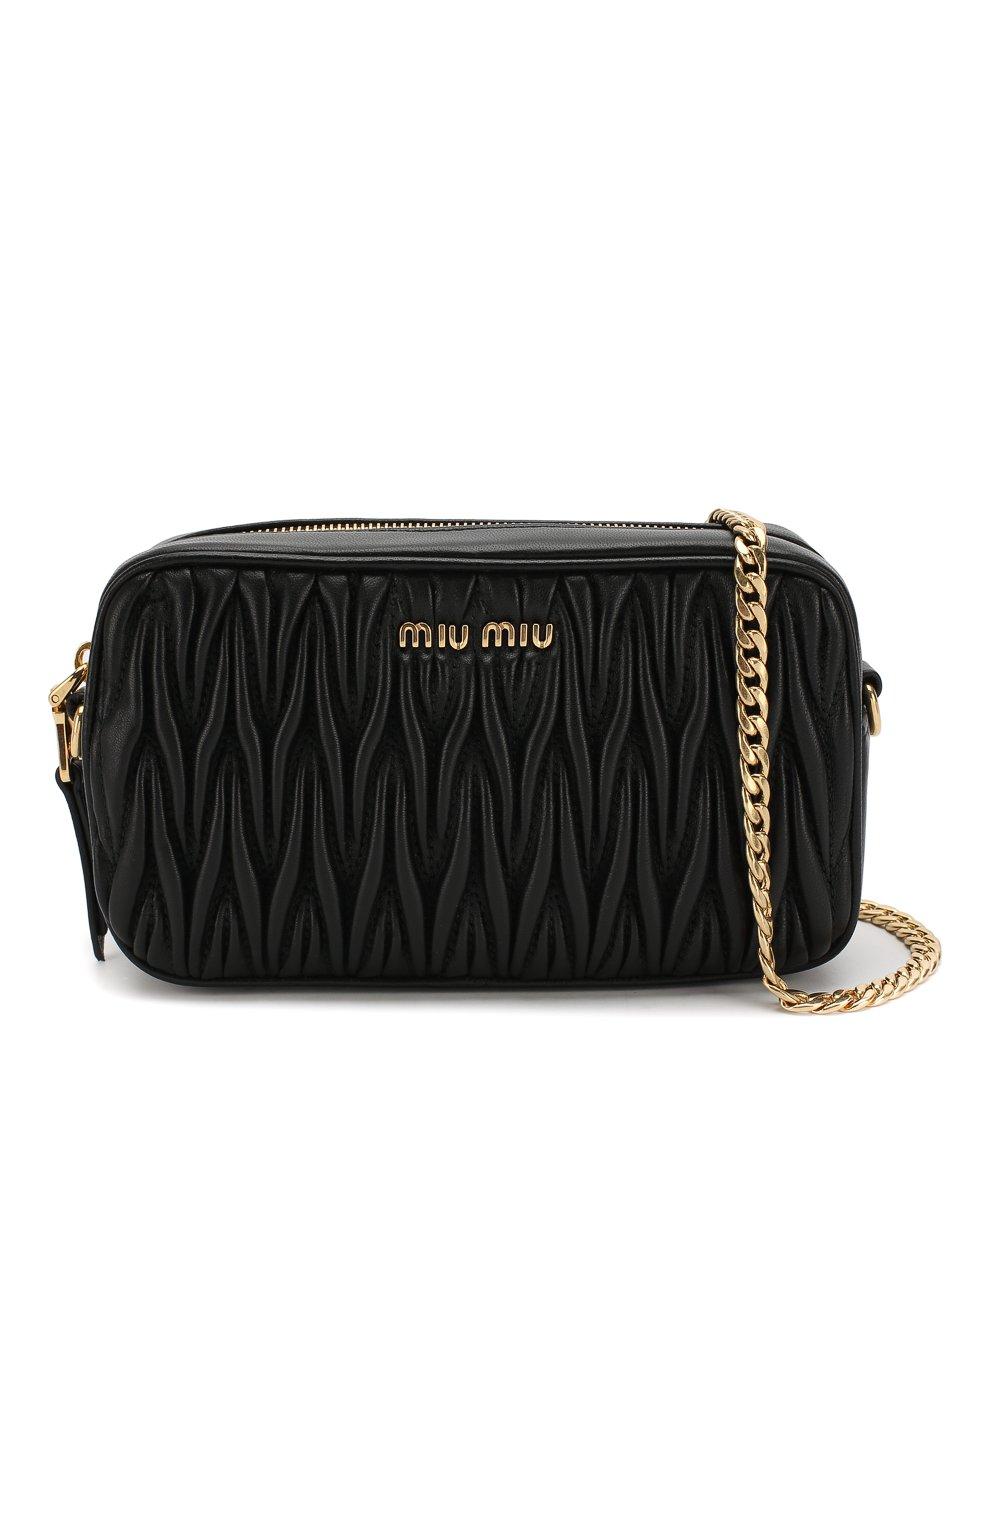 Женская поясная сумка MIU MIU черного цвета, арт. 5BL005-N88-F0002-COO | Фото 6